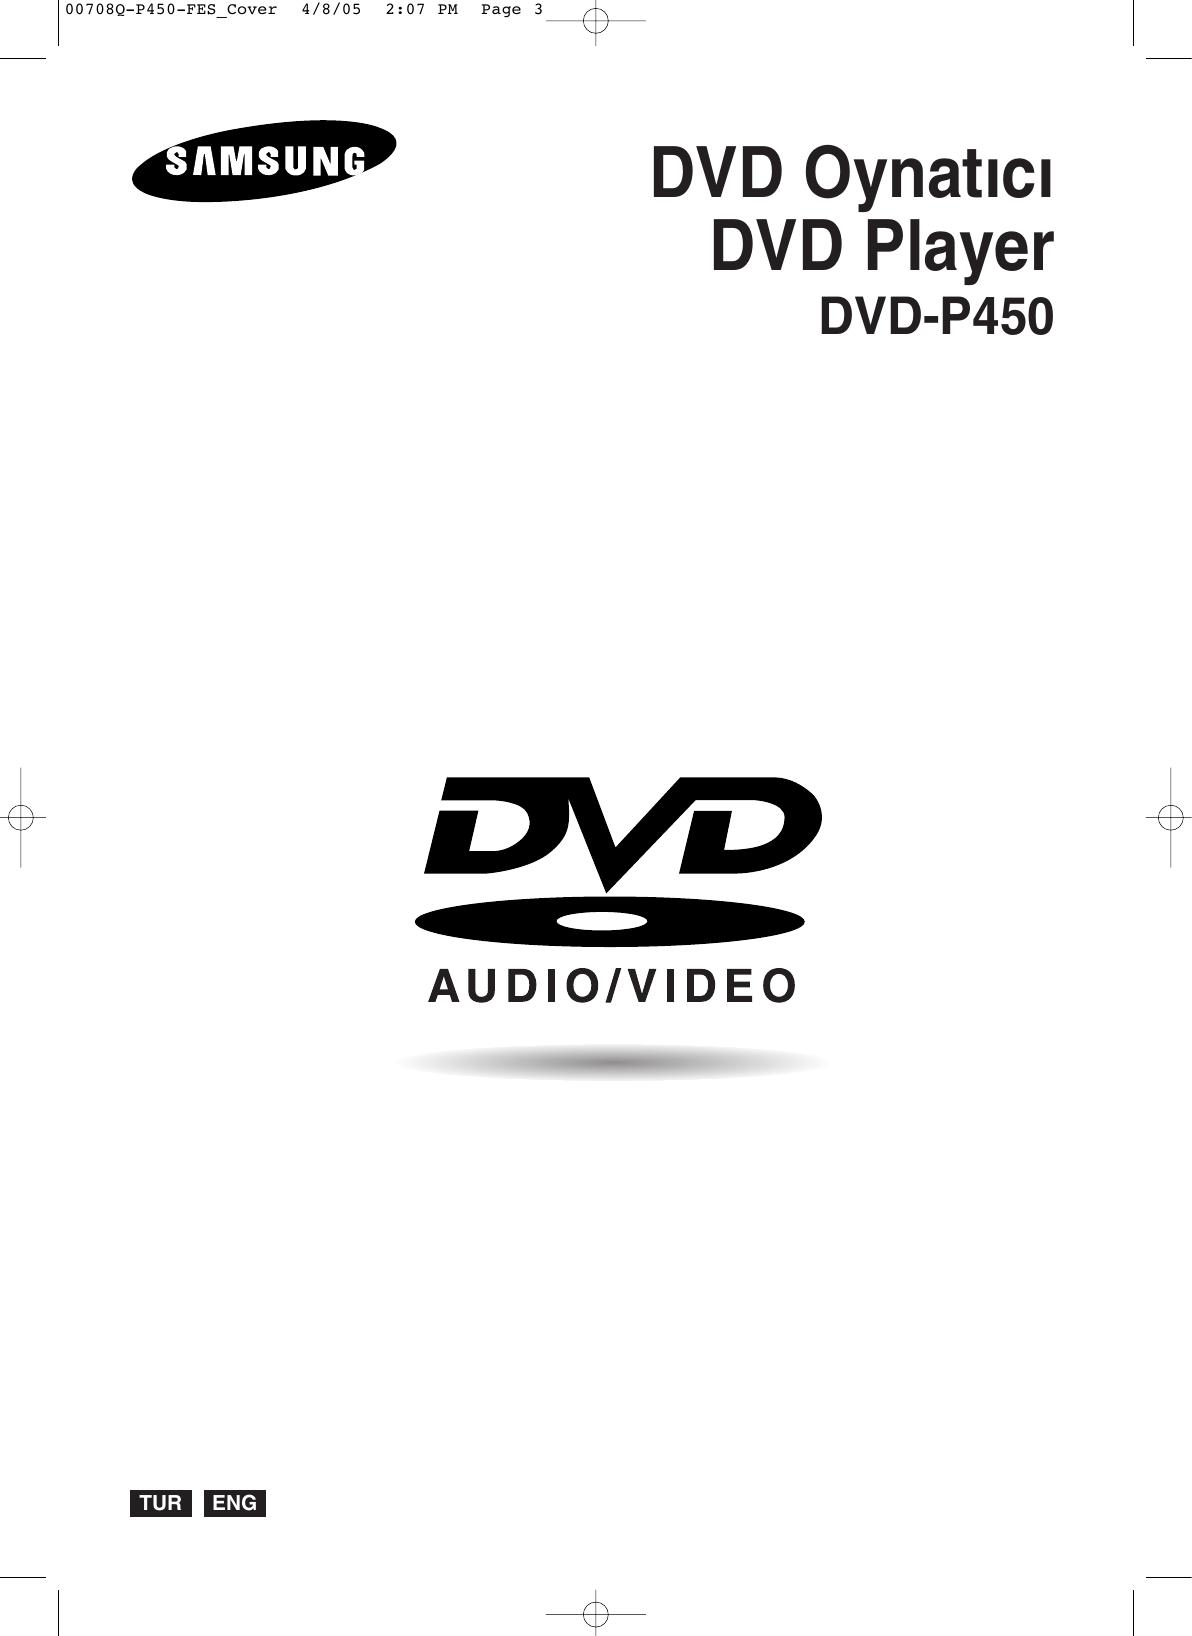 Samsung Dvd P450 20050504083112734 00708q Fes Tur Eng